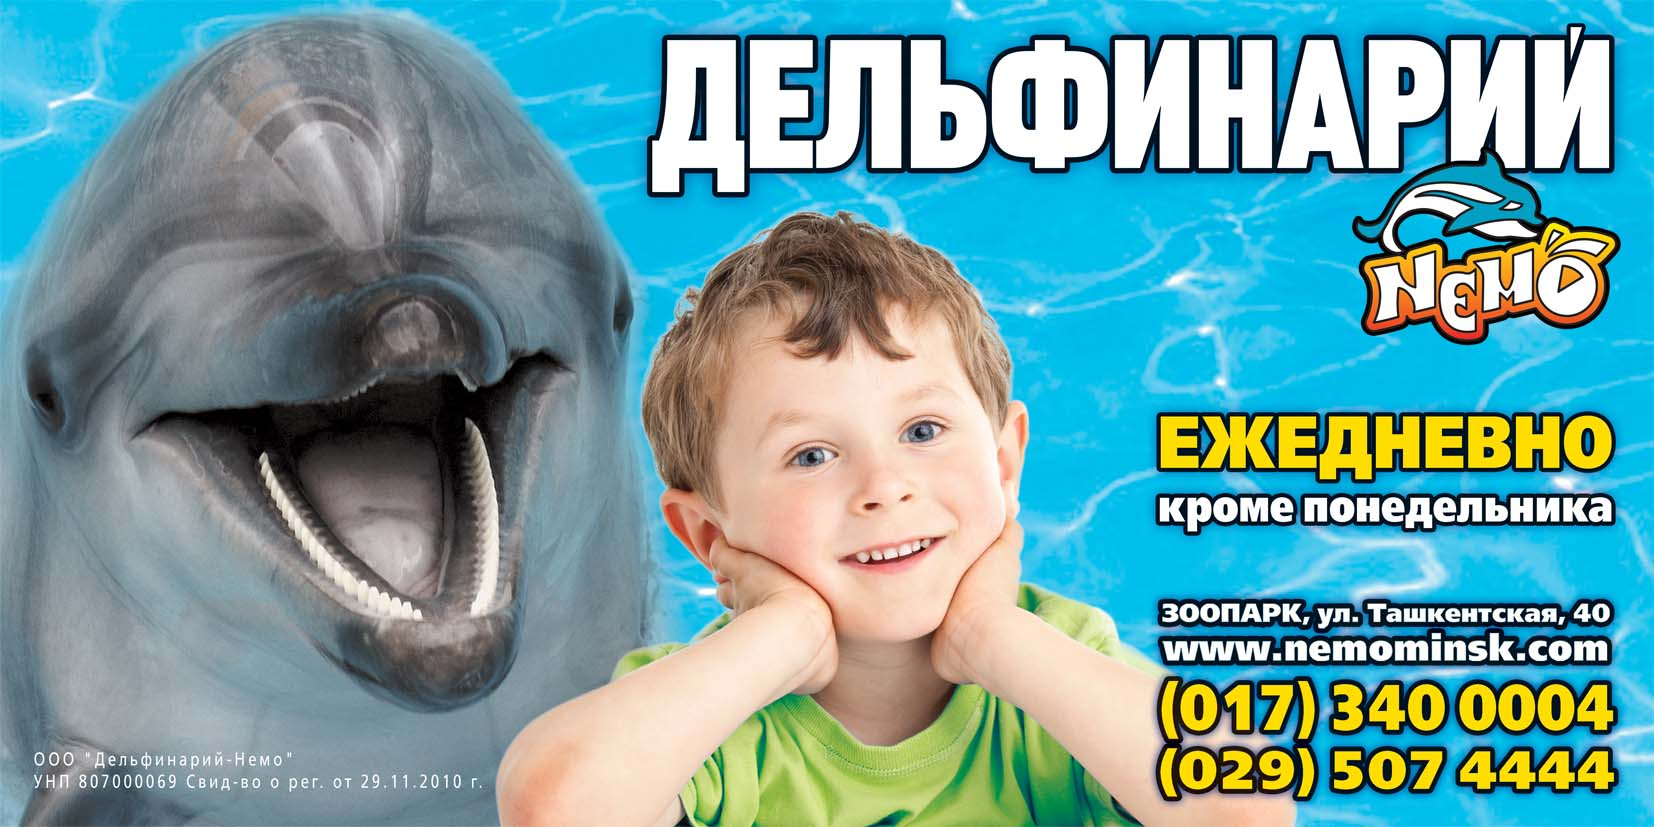 Nemo, the Dolphinarium in Golubitskaya, invites to visit